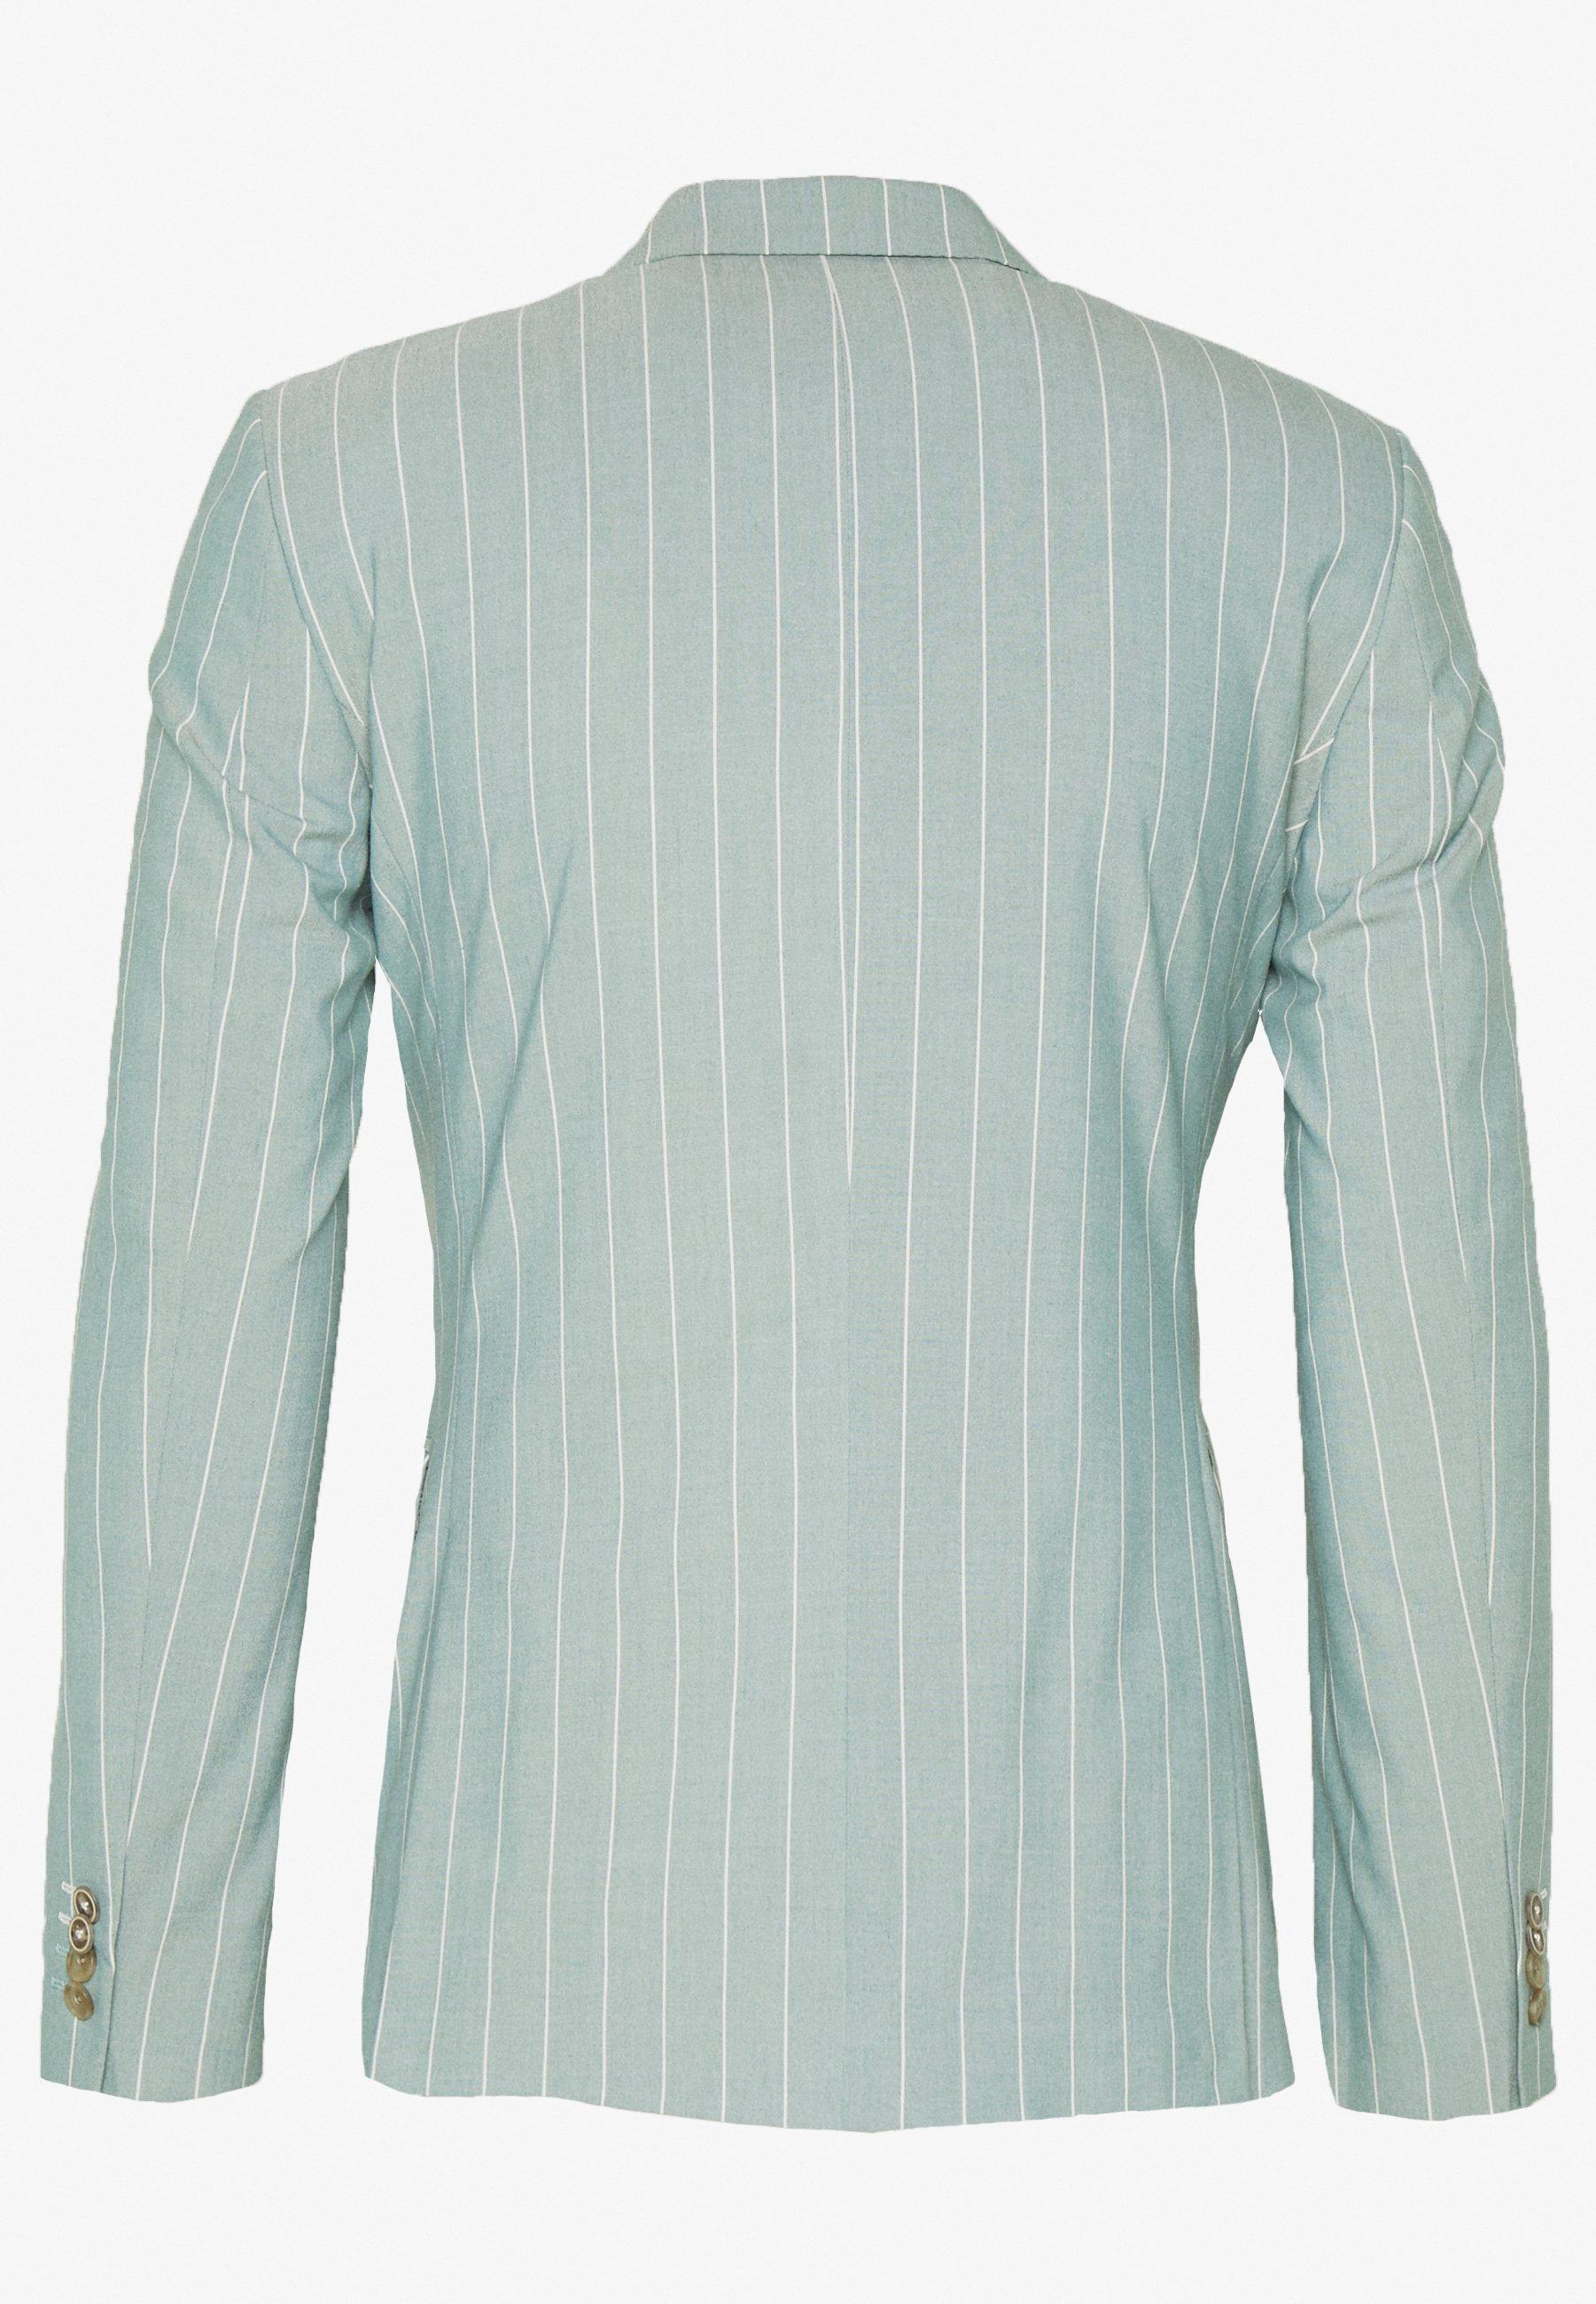 1904 Moore Pin Stripe Jacket Skinny - Giacca Elegante Green fdBAwF5